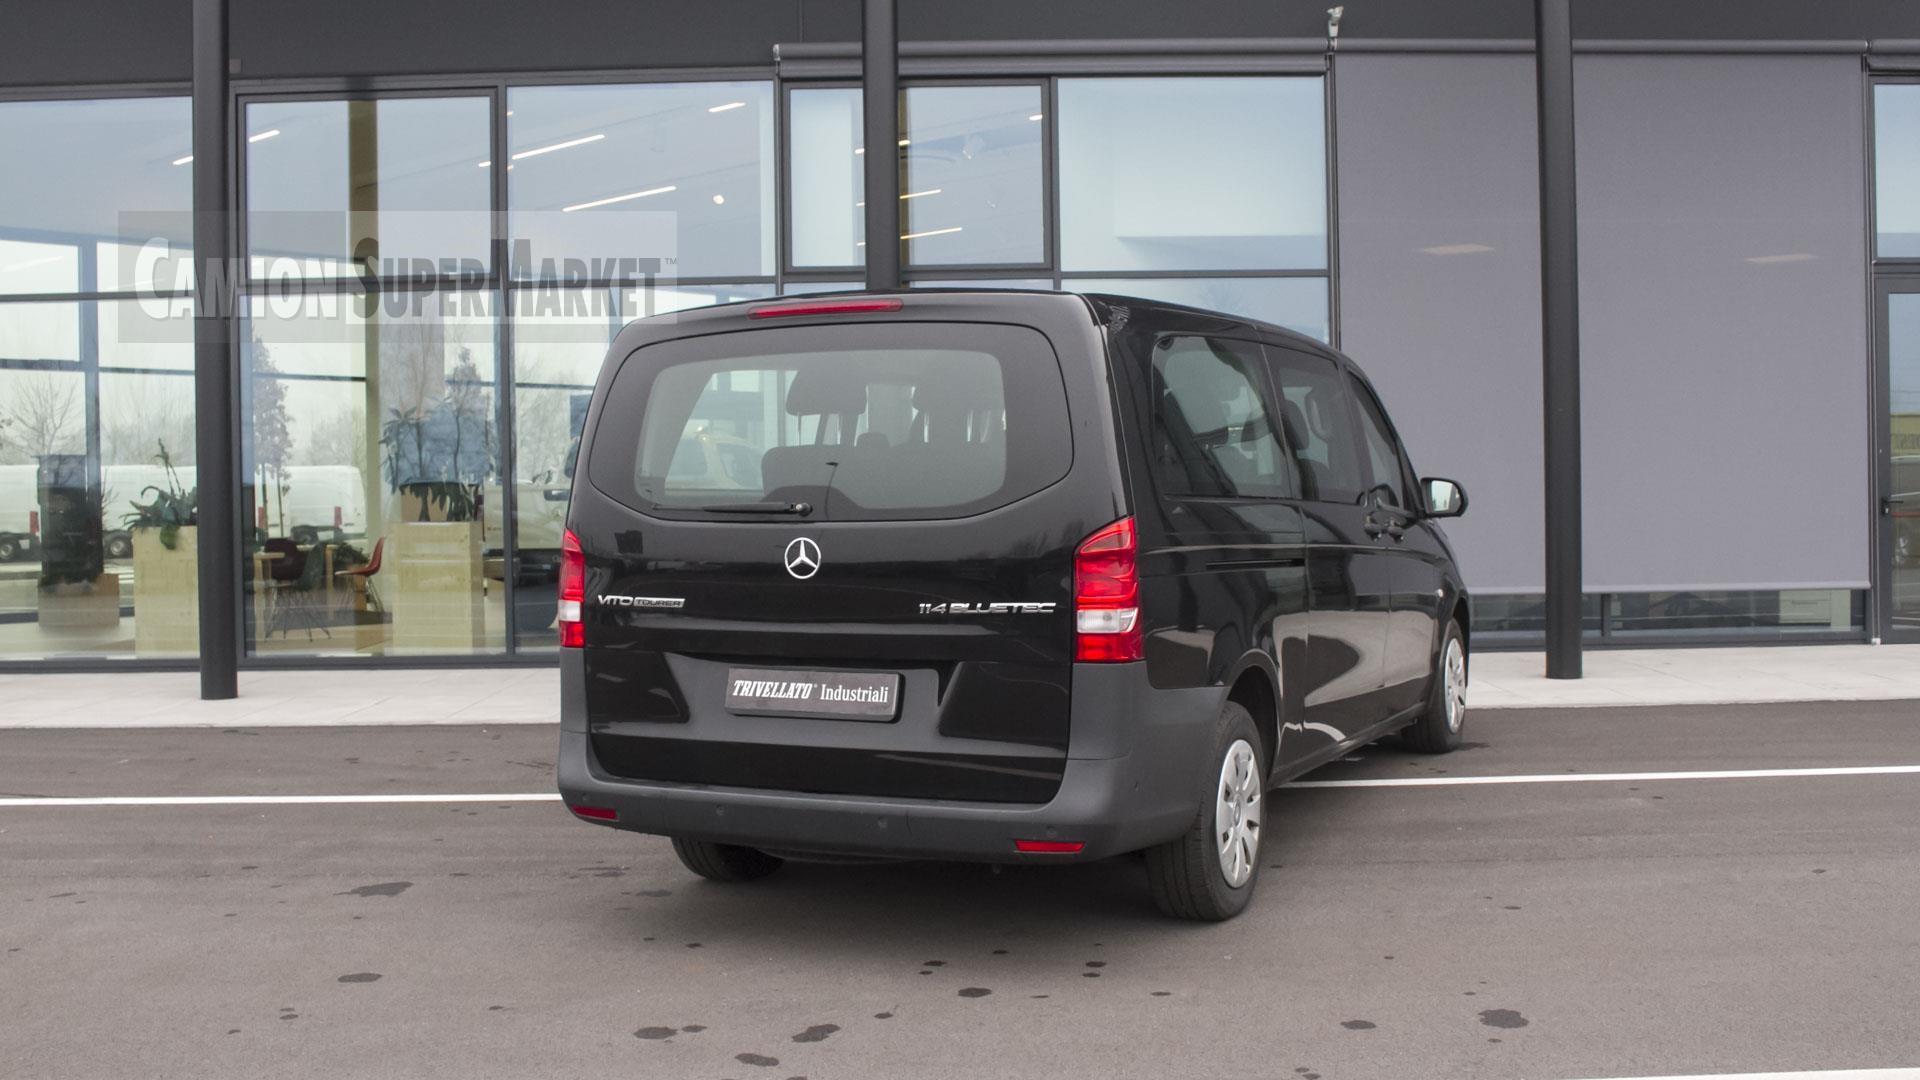 Mercedes-Benz VITO 114 Uzywany 2016 Veneto